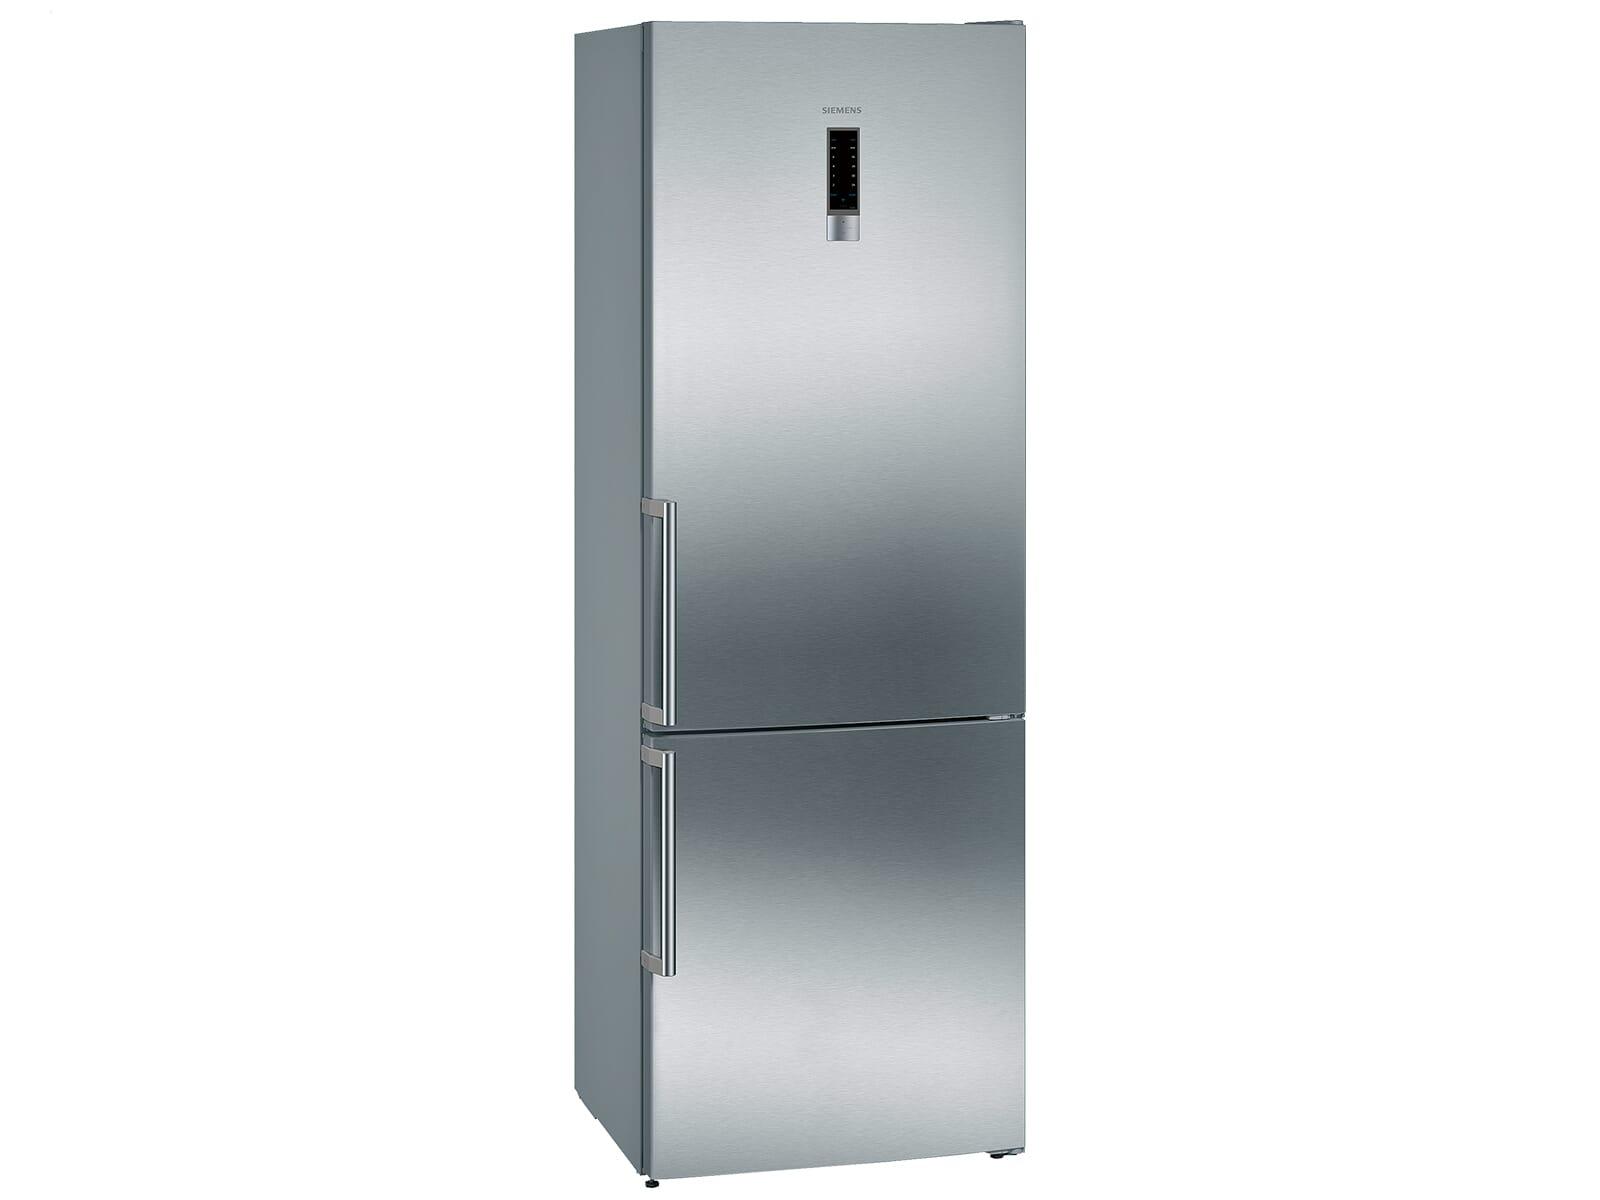 Siemens Kühlschrank Wlan : Siemens kg49nxi40 kühl gefrierkombination edelstahl